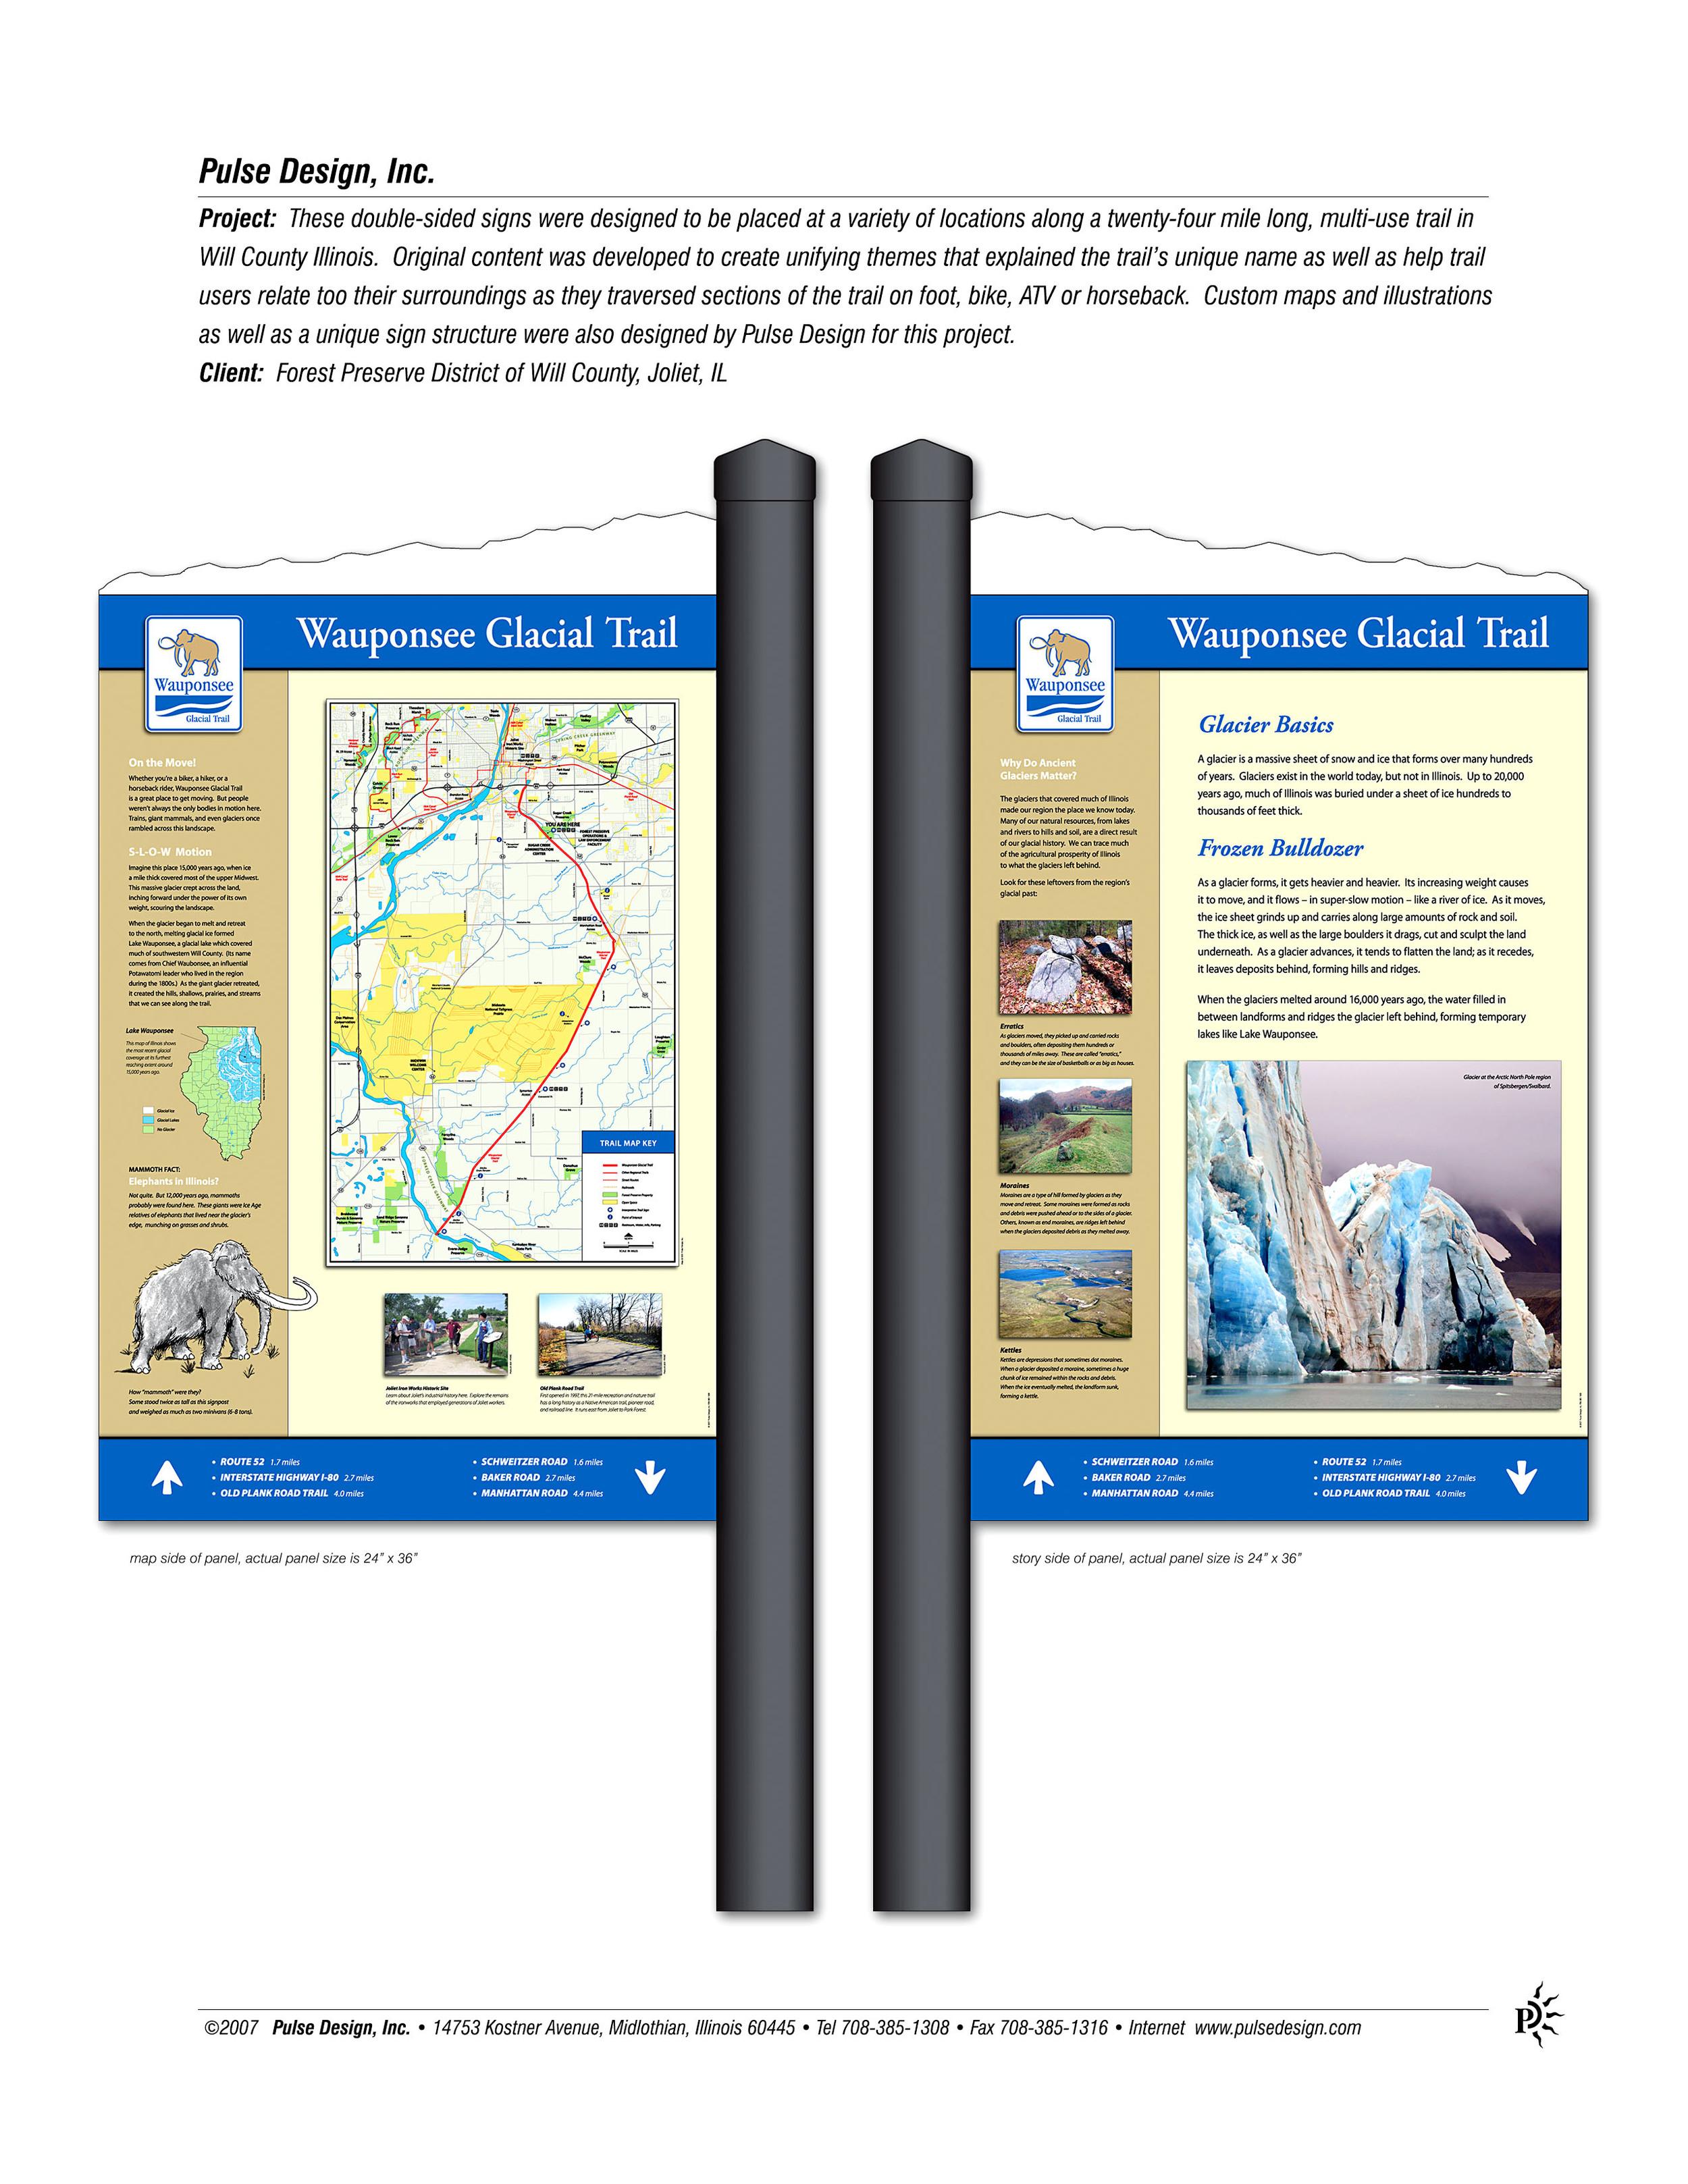 Wauponsee-Glacial-Trail-Signs-1-Pulse-Design-Inc.jpg